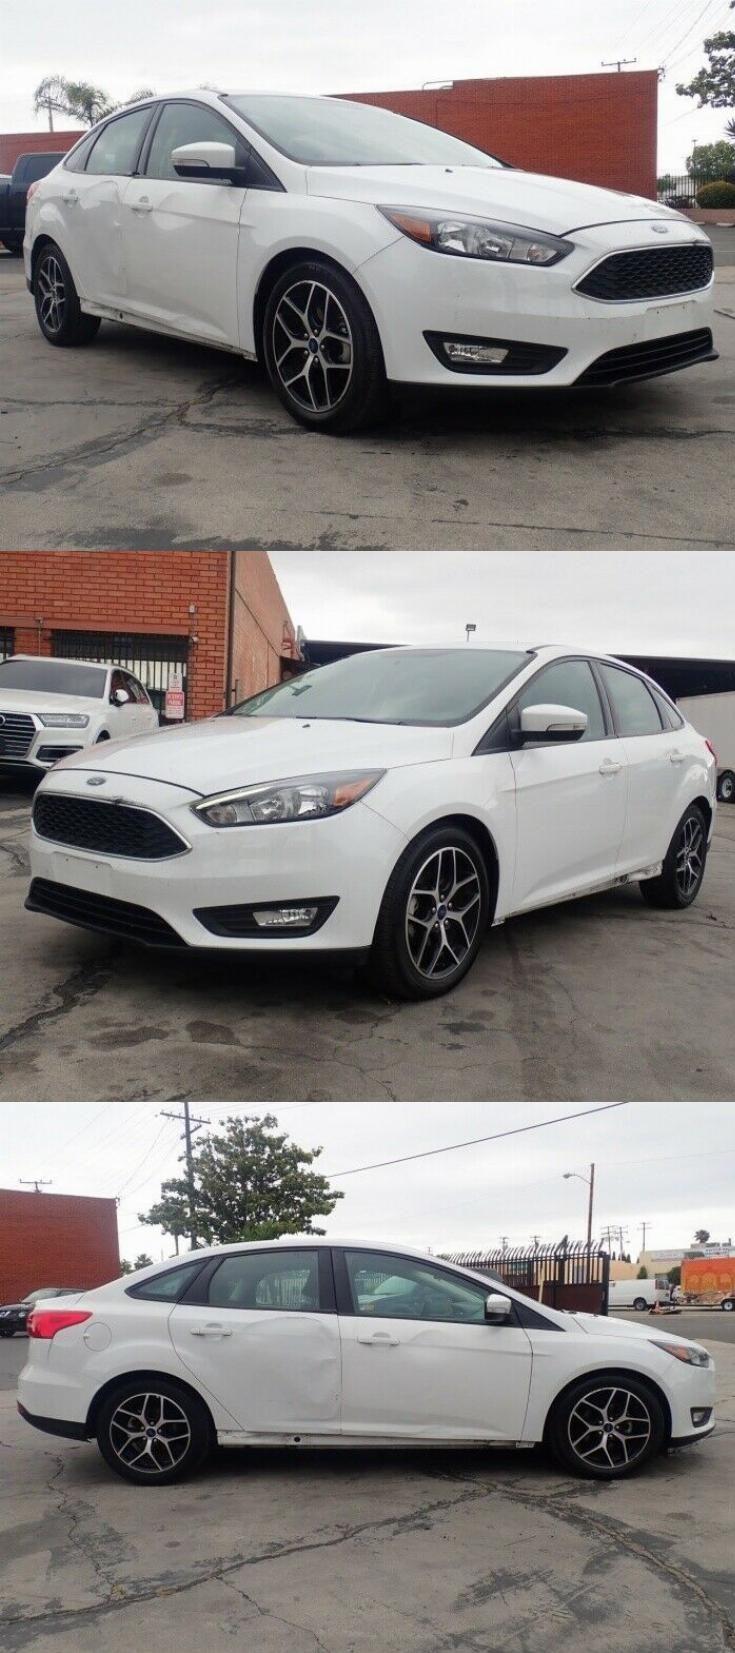 Light Damage 2017 Ford Focus Sel Repairable Cars For Sale Ford Focus Sports Cars For Sale